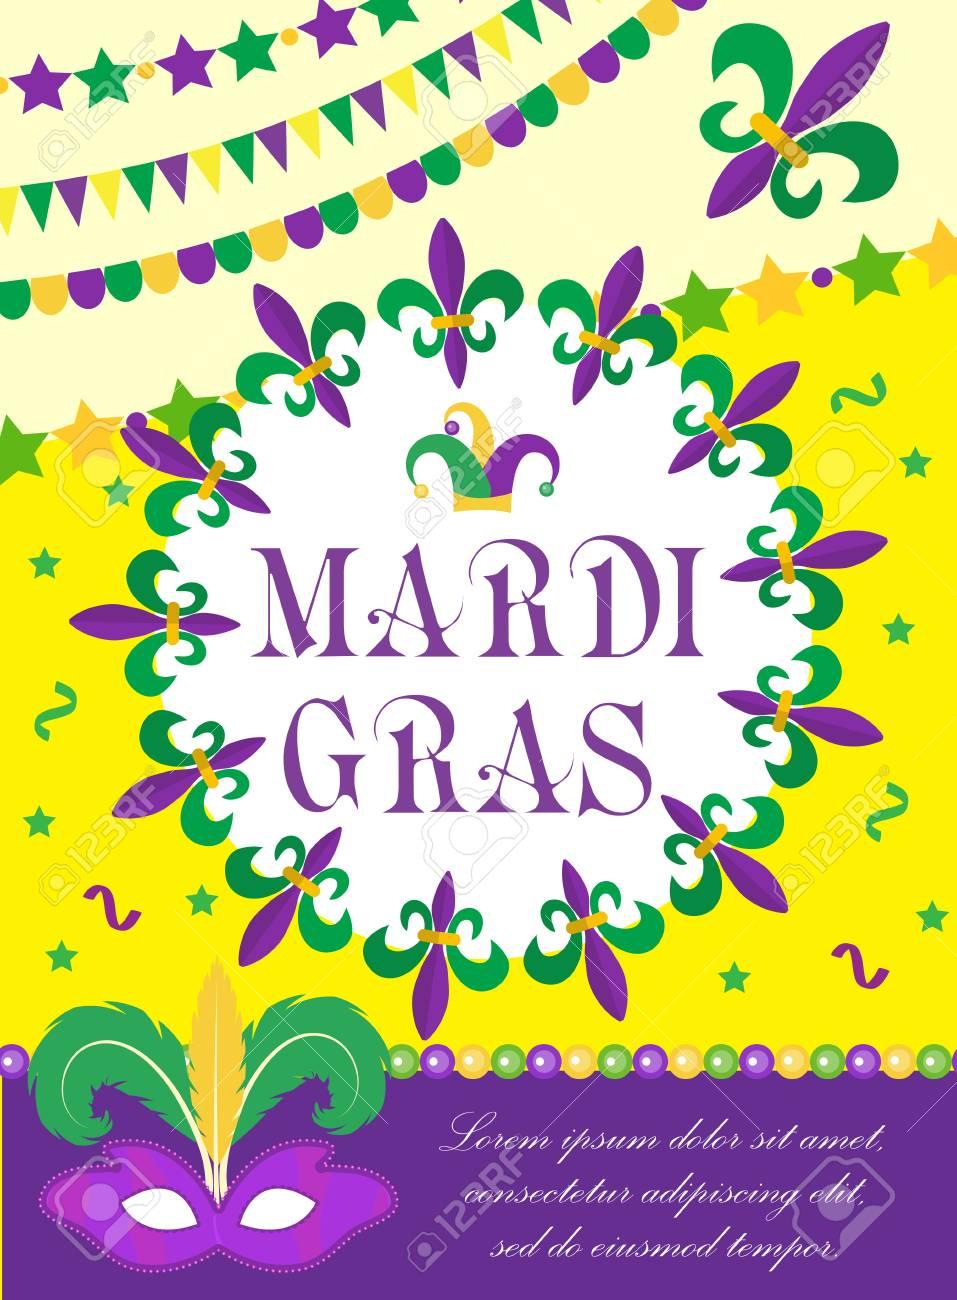 Mardi Gras carnival poster, invitation, greeting card. Happy Mardi Gras Template for your